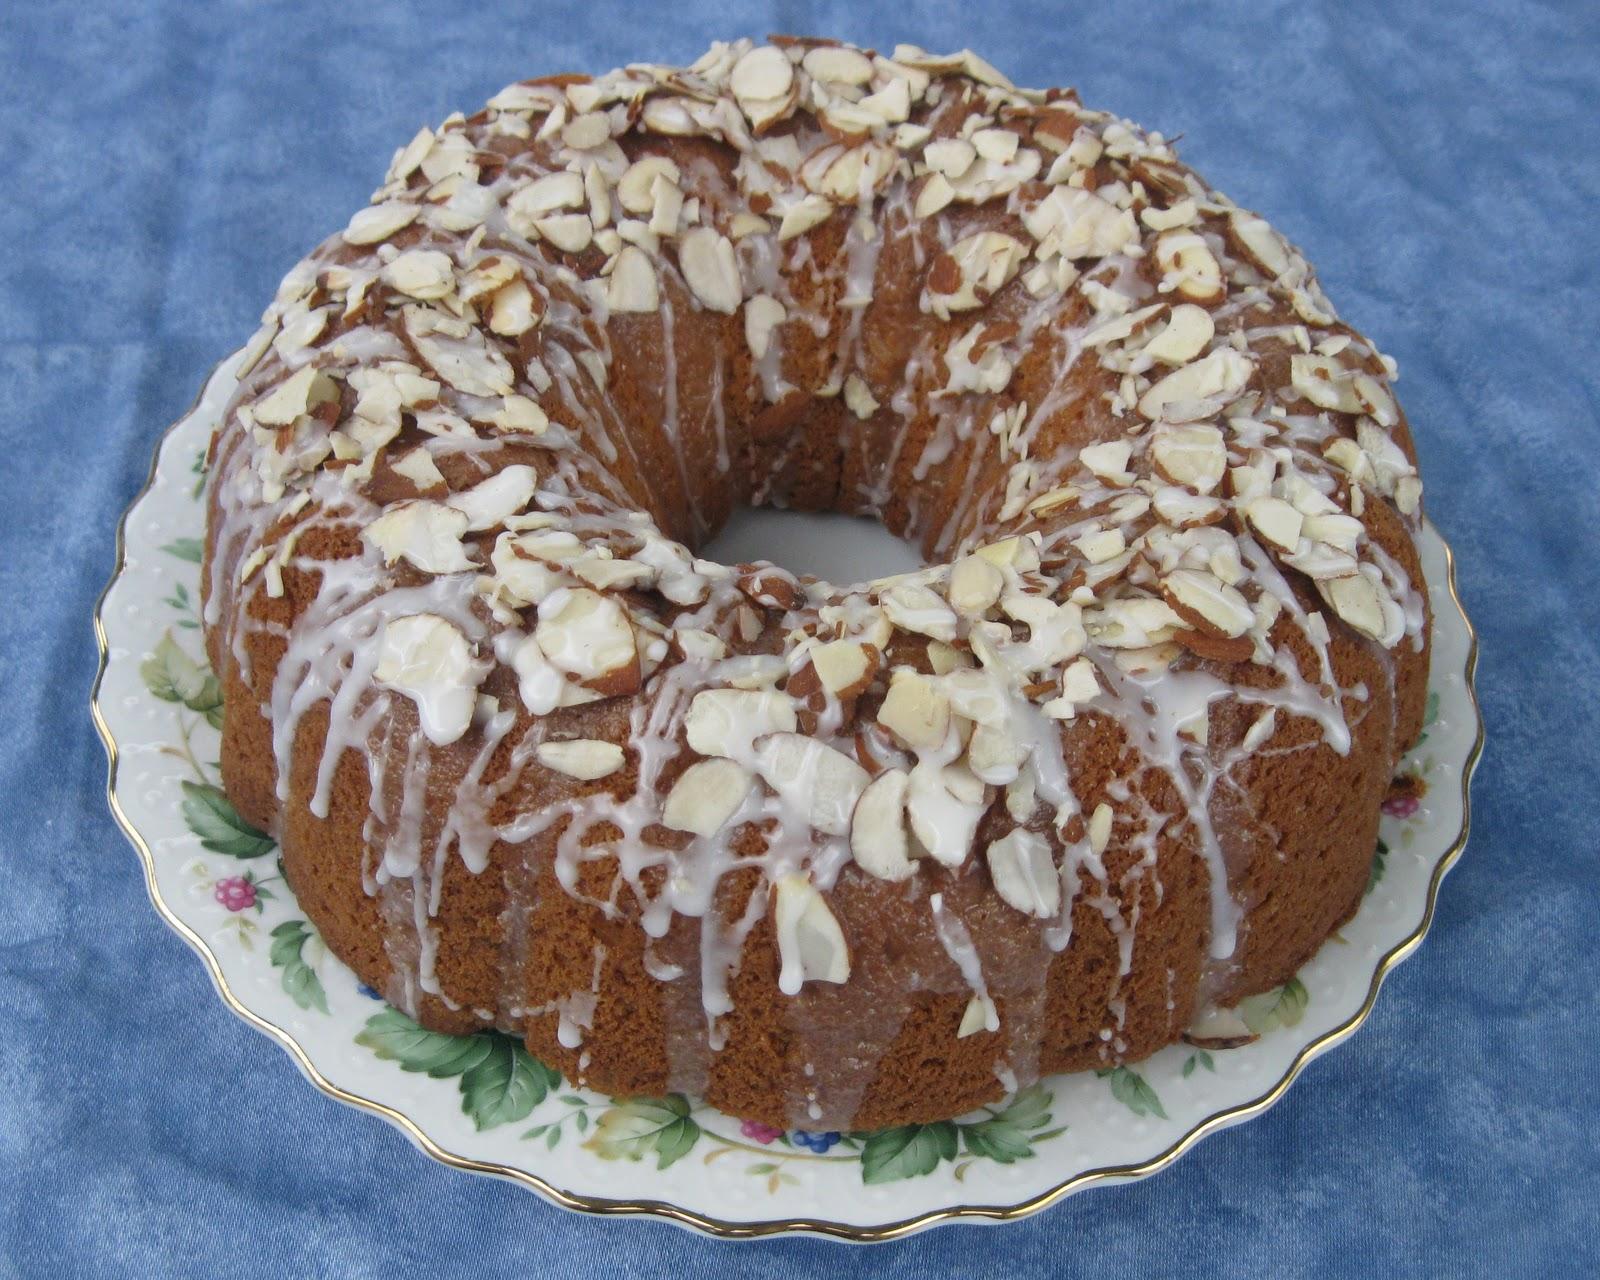 Marys Apple Almond Cake